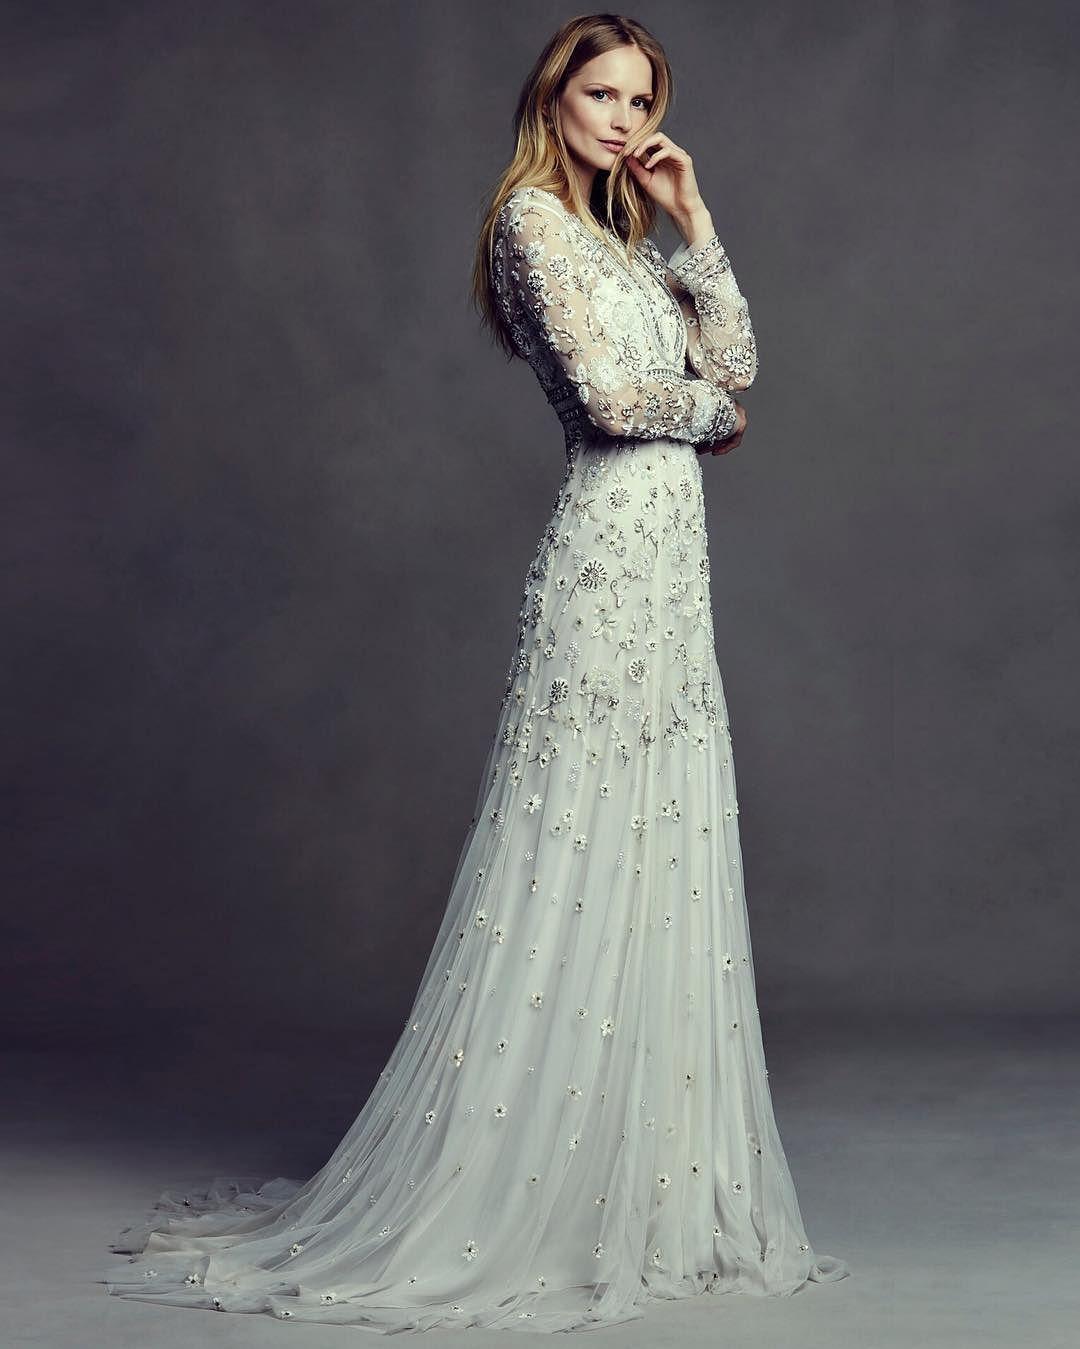 Slim fit wedding dresses  Those sleeves That beading The sleek silhouette Wow factor